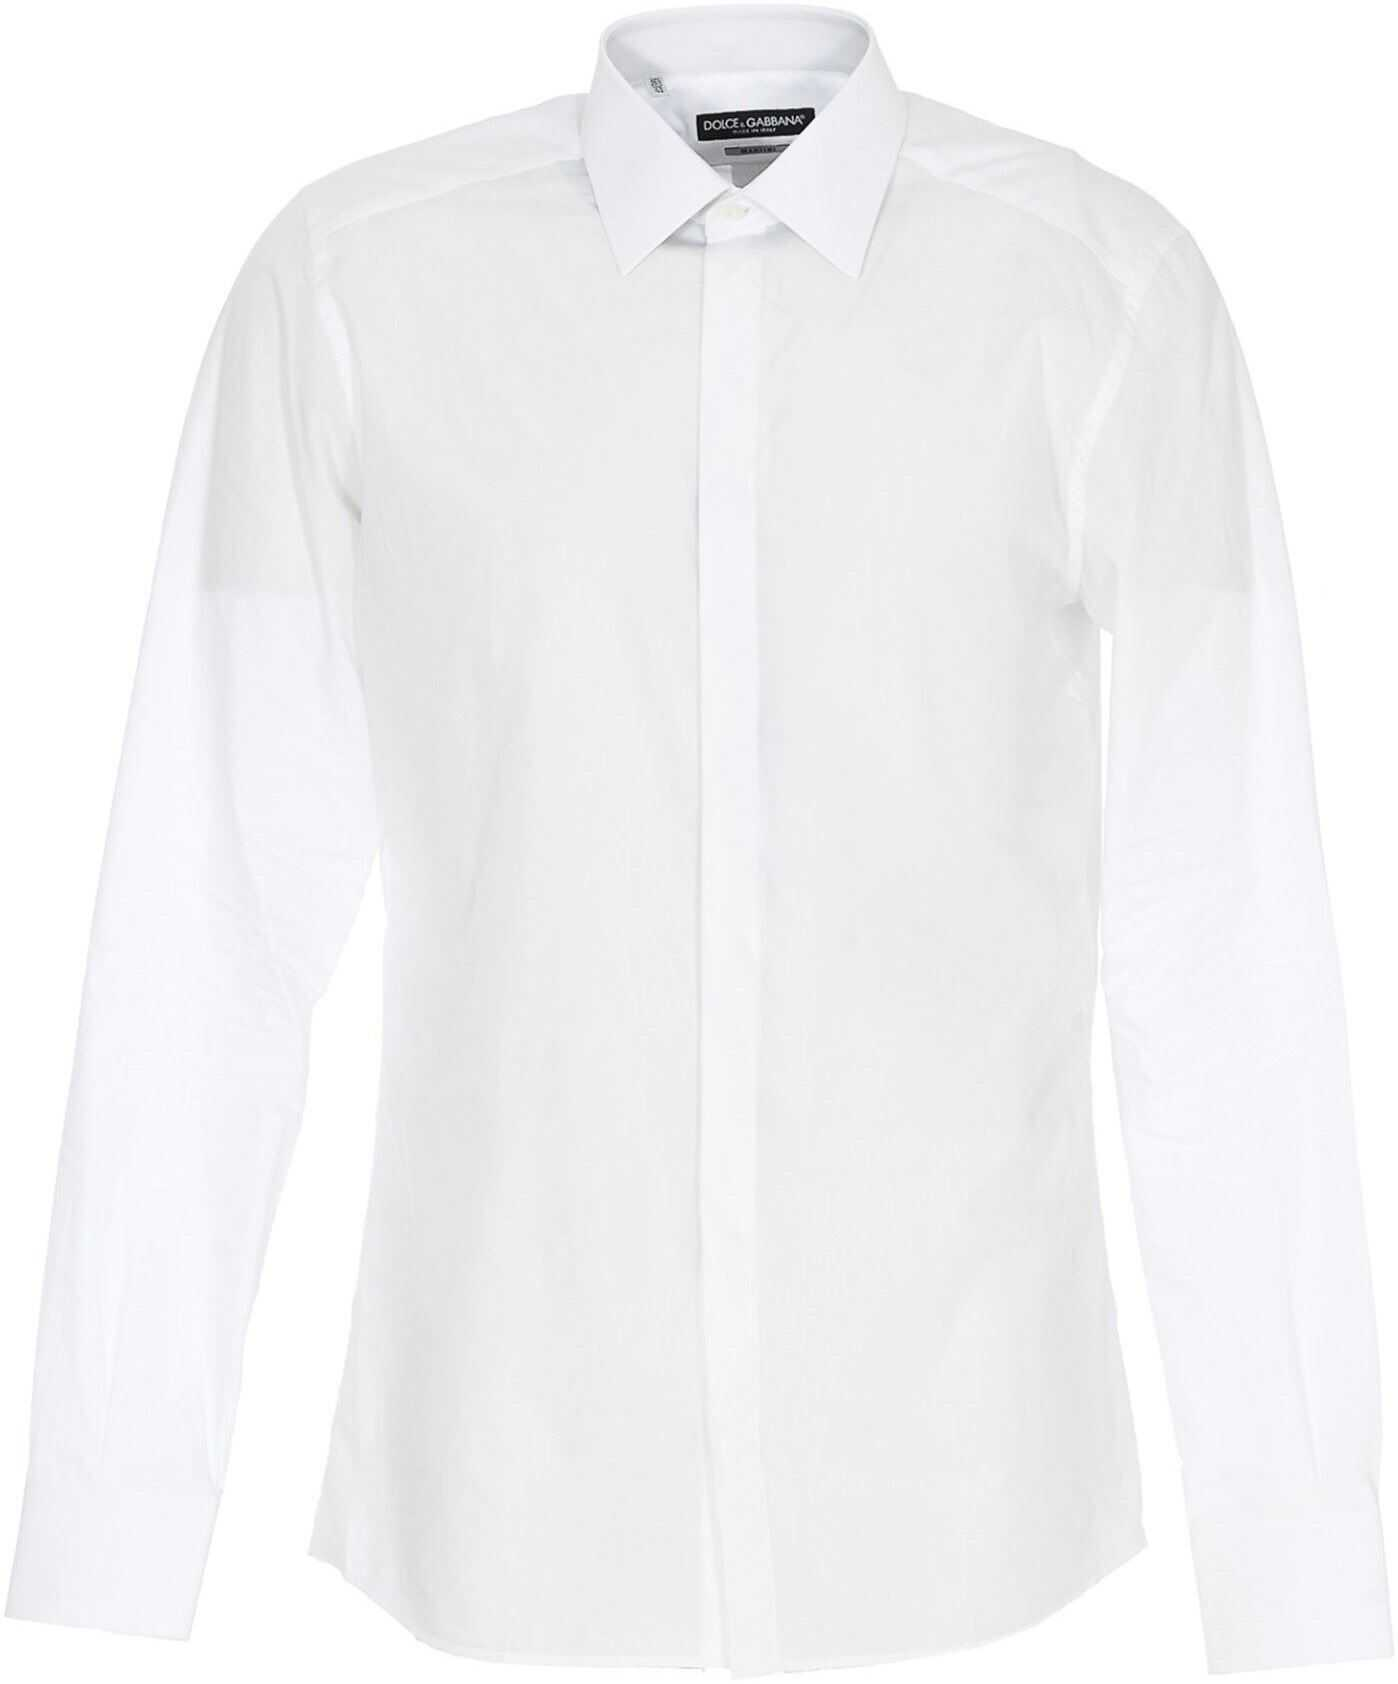 Dolce & Gabbana Cotton Poplin Shirt In White White imagine